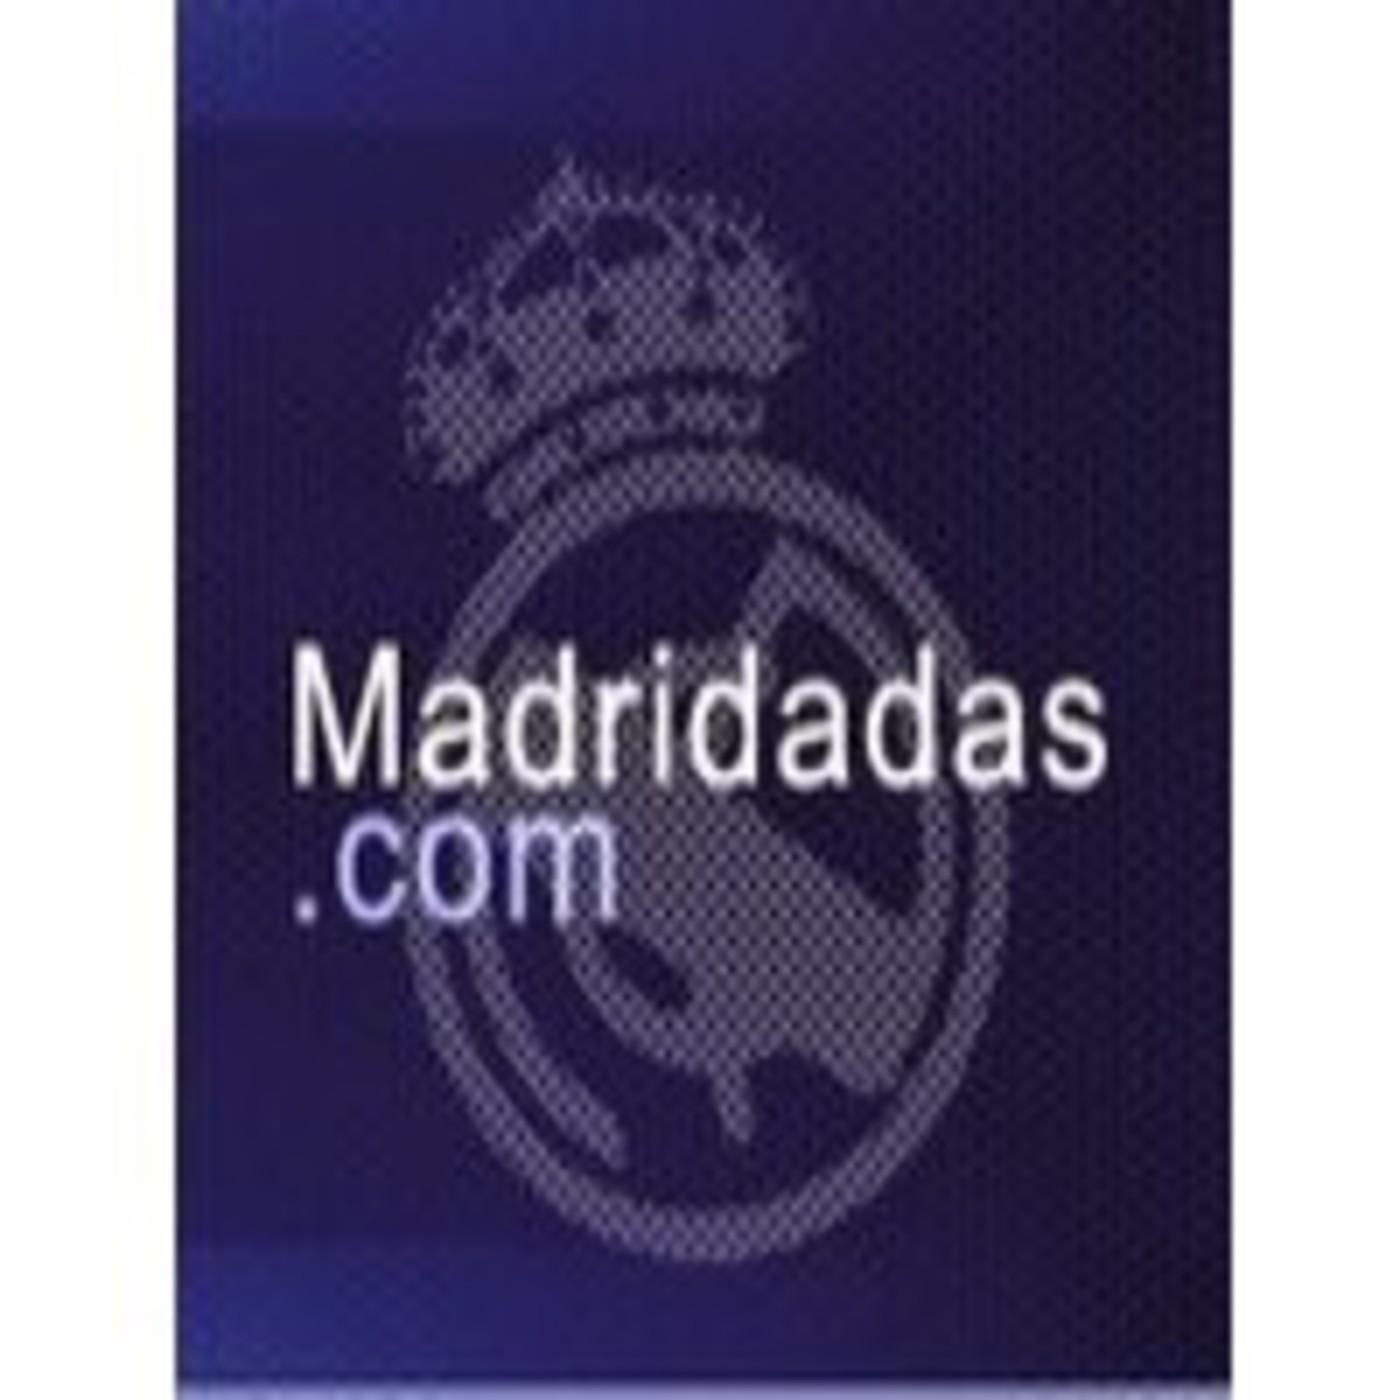 <![CDATA[Podcast Madridadas]]>